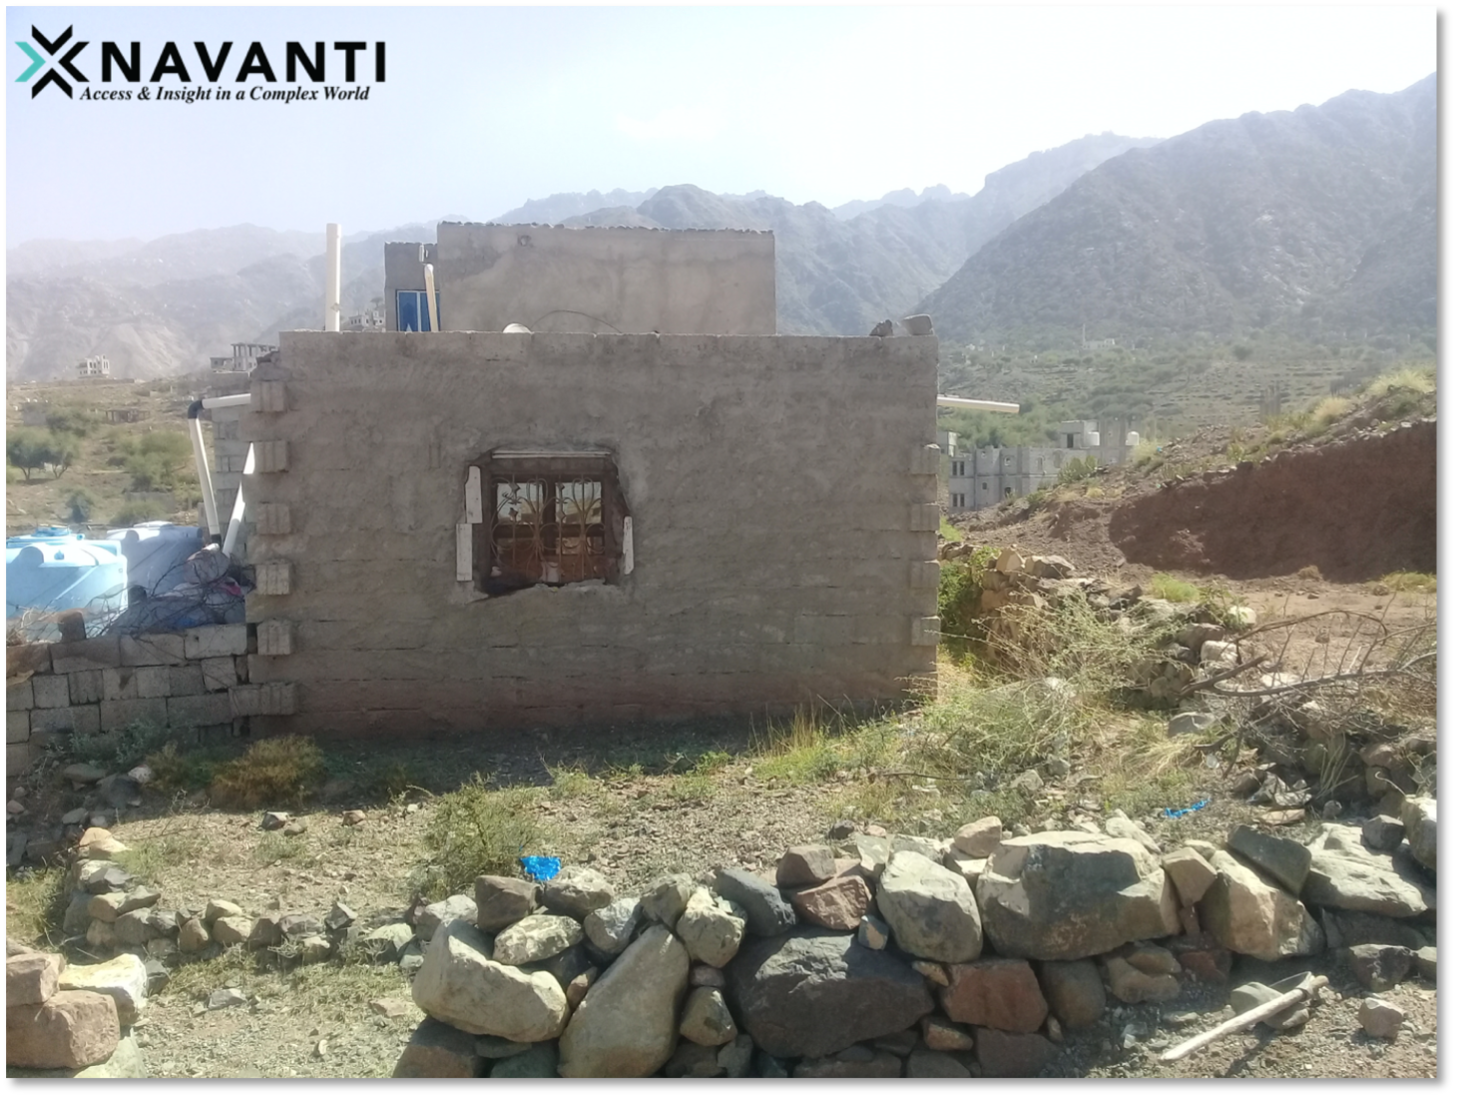 Home of displaced household outside of Ta'izz City, Yemen, Source: Navanti